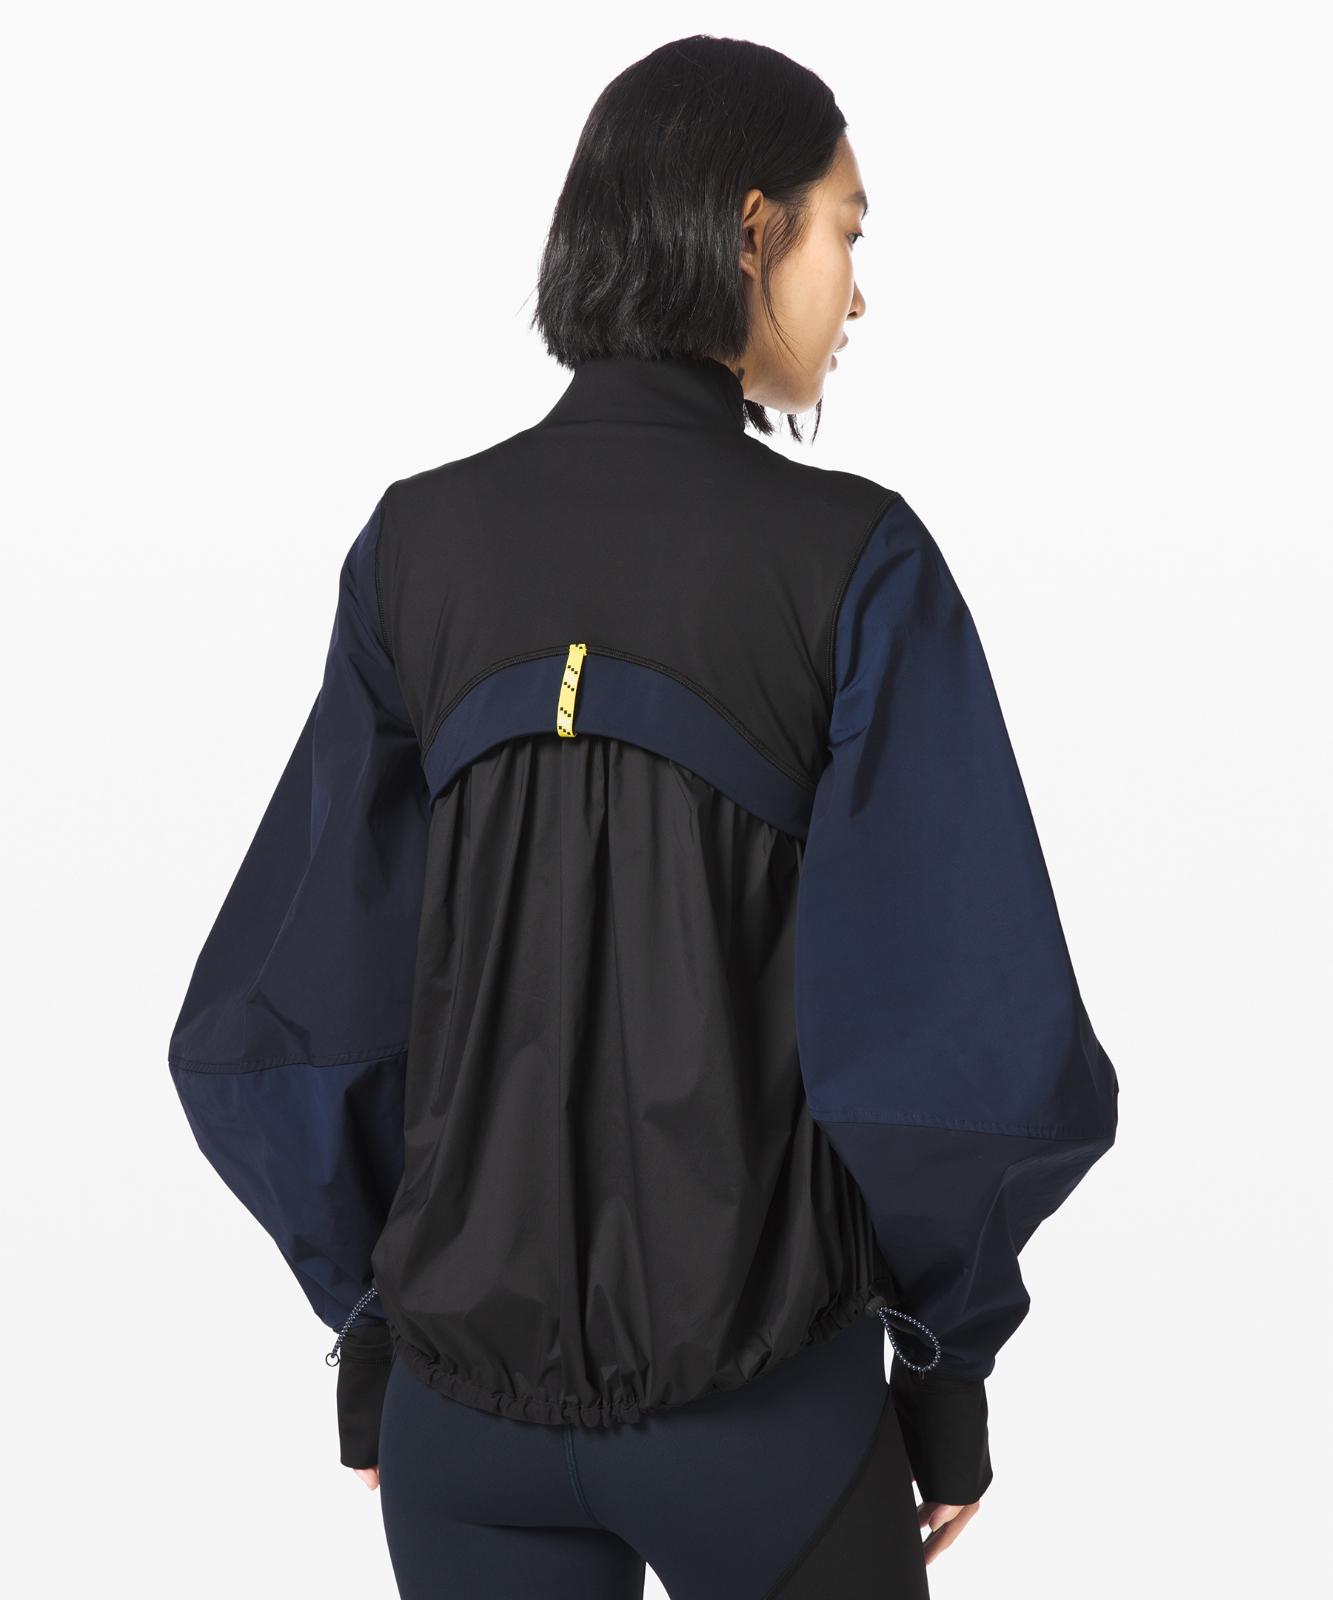 Face Forward Define Jacket, Lululemon x Roksanda